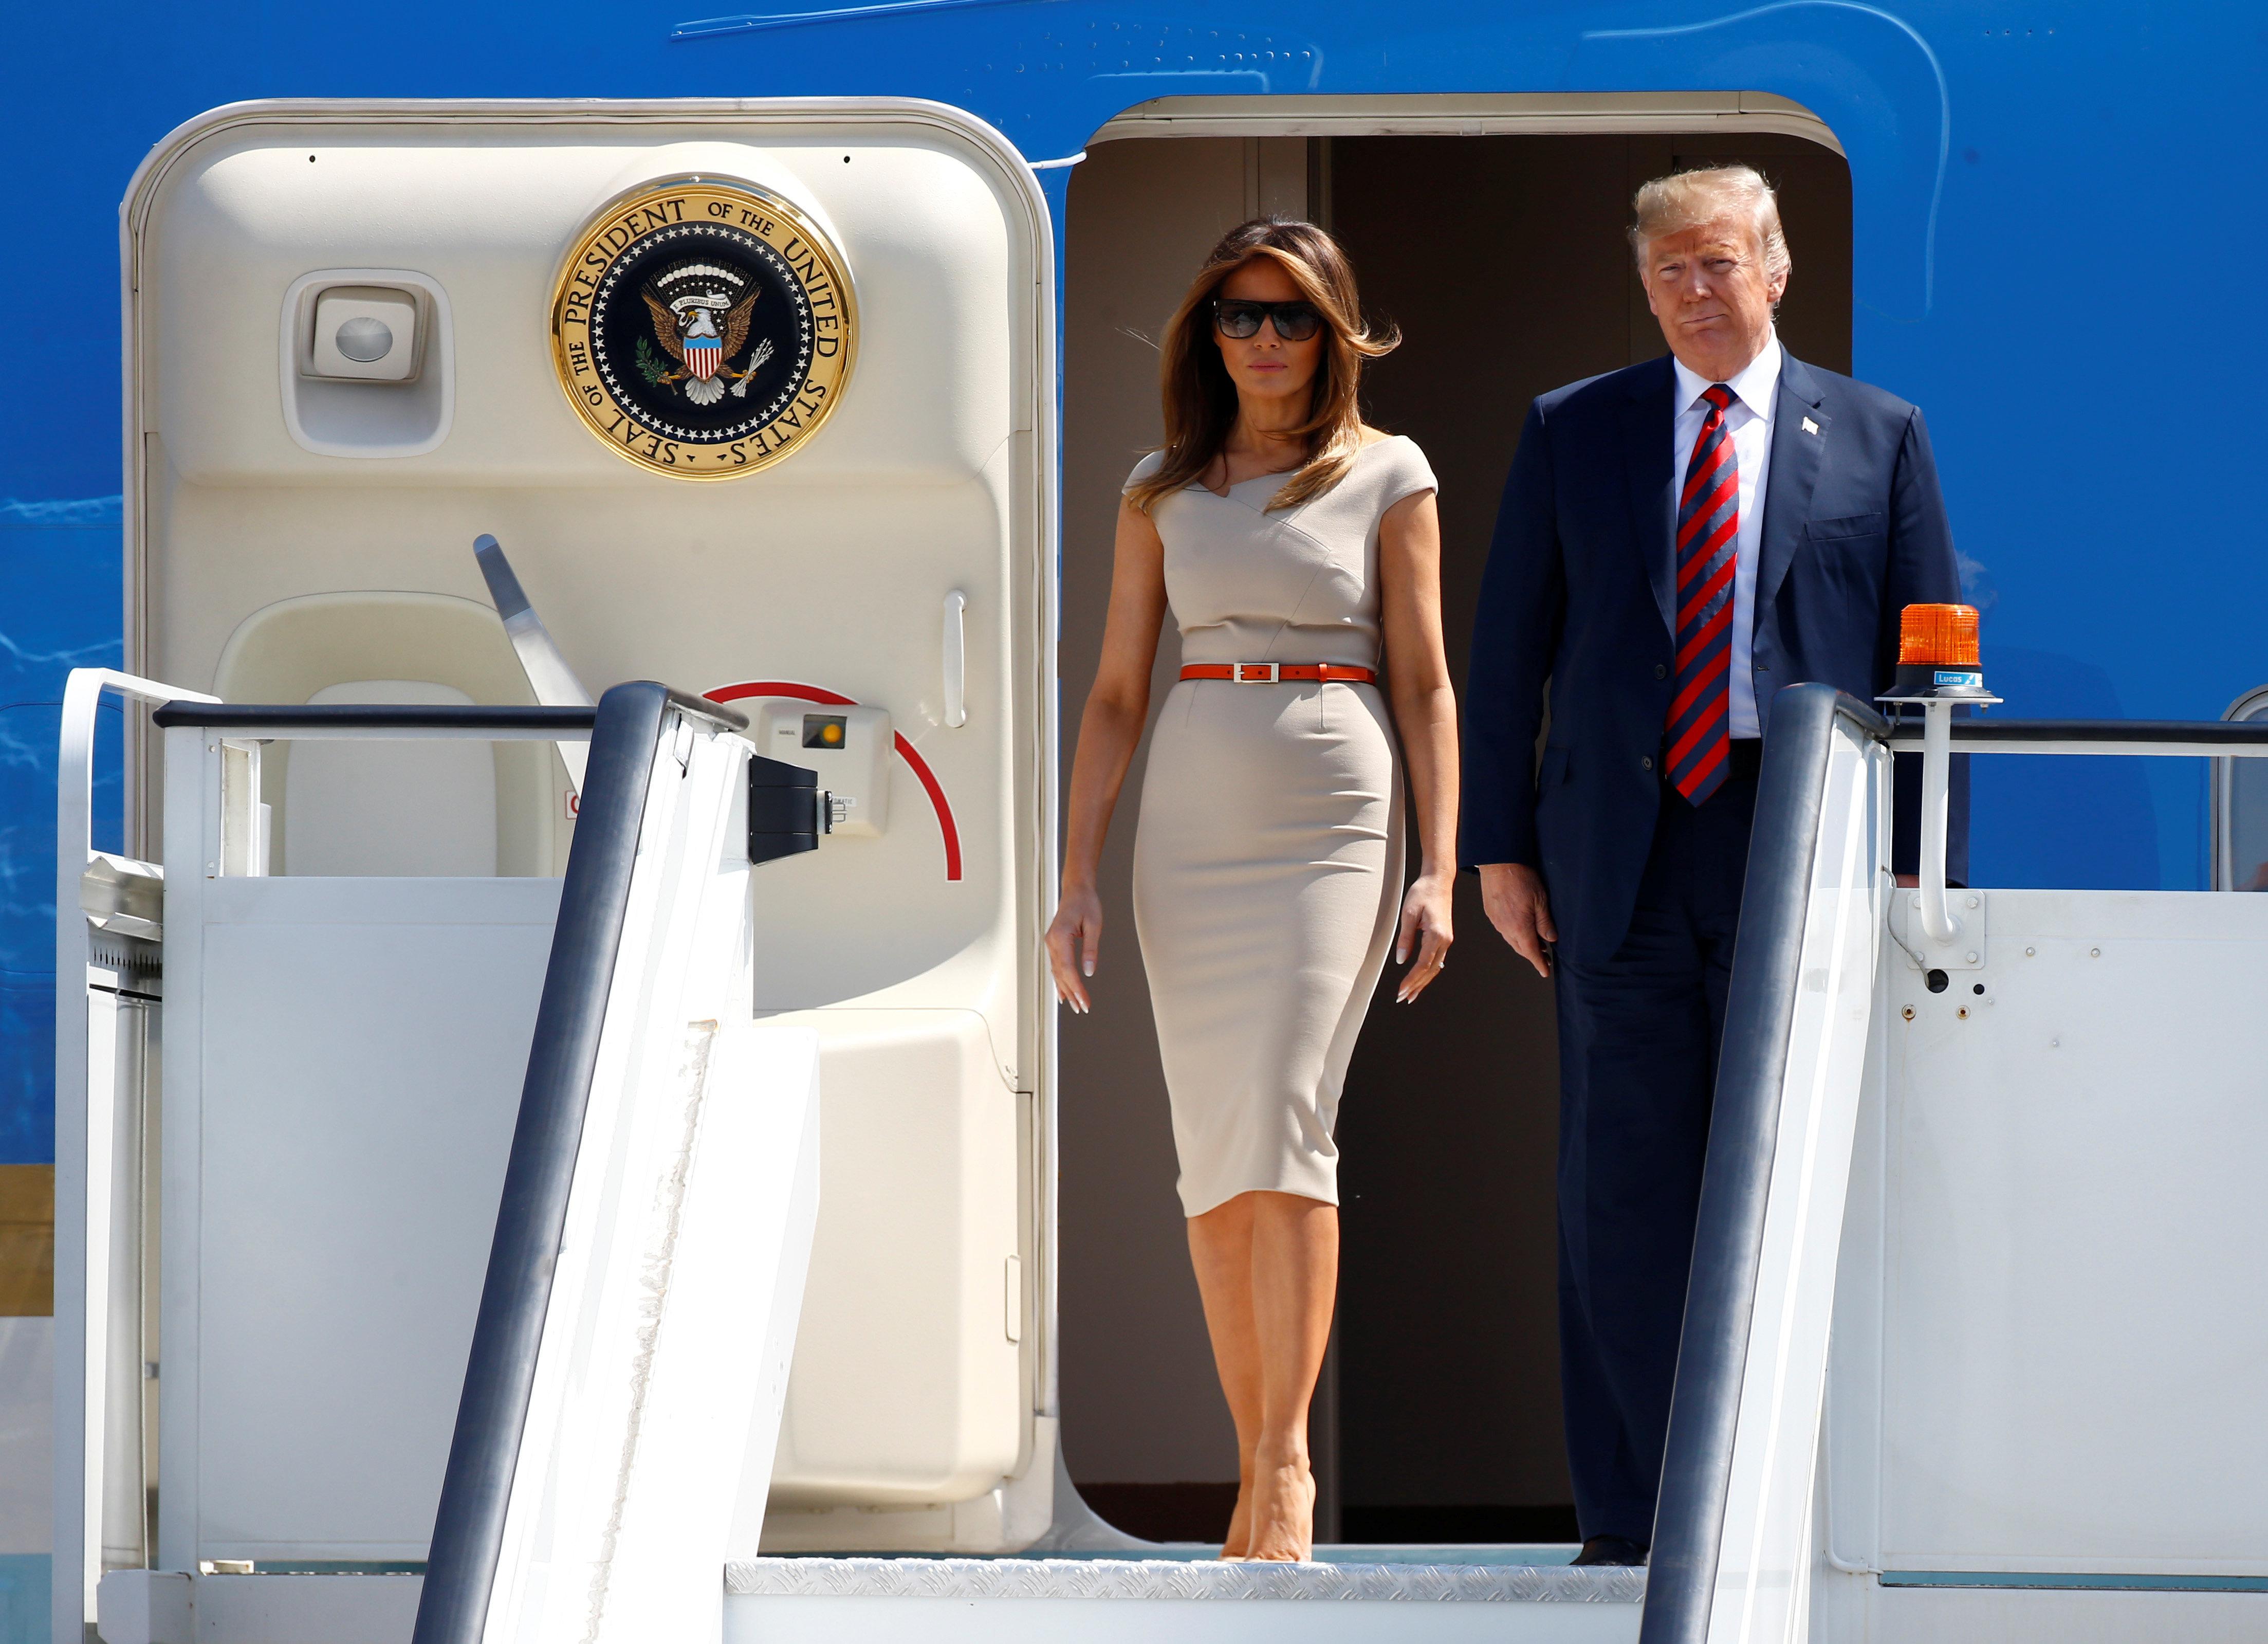 Interna: Trump rastete in